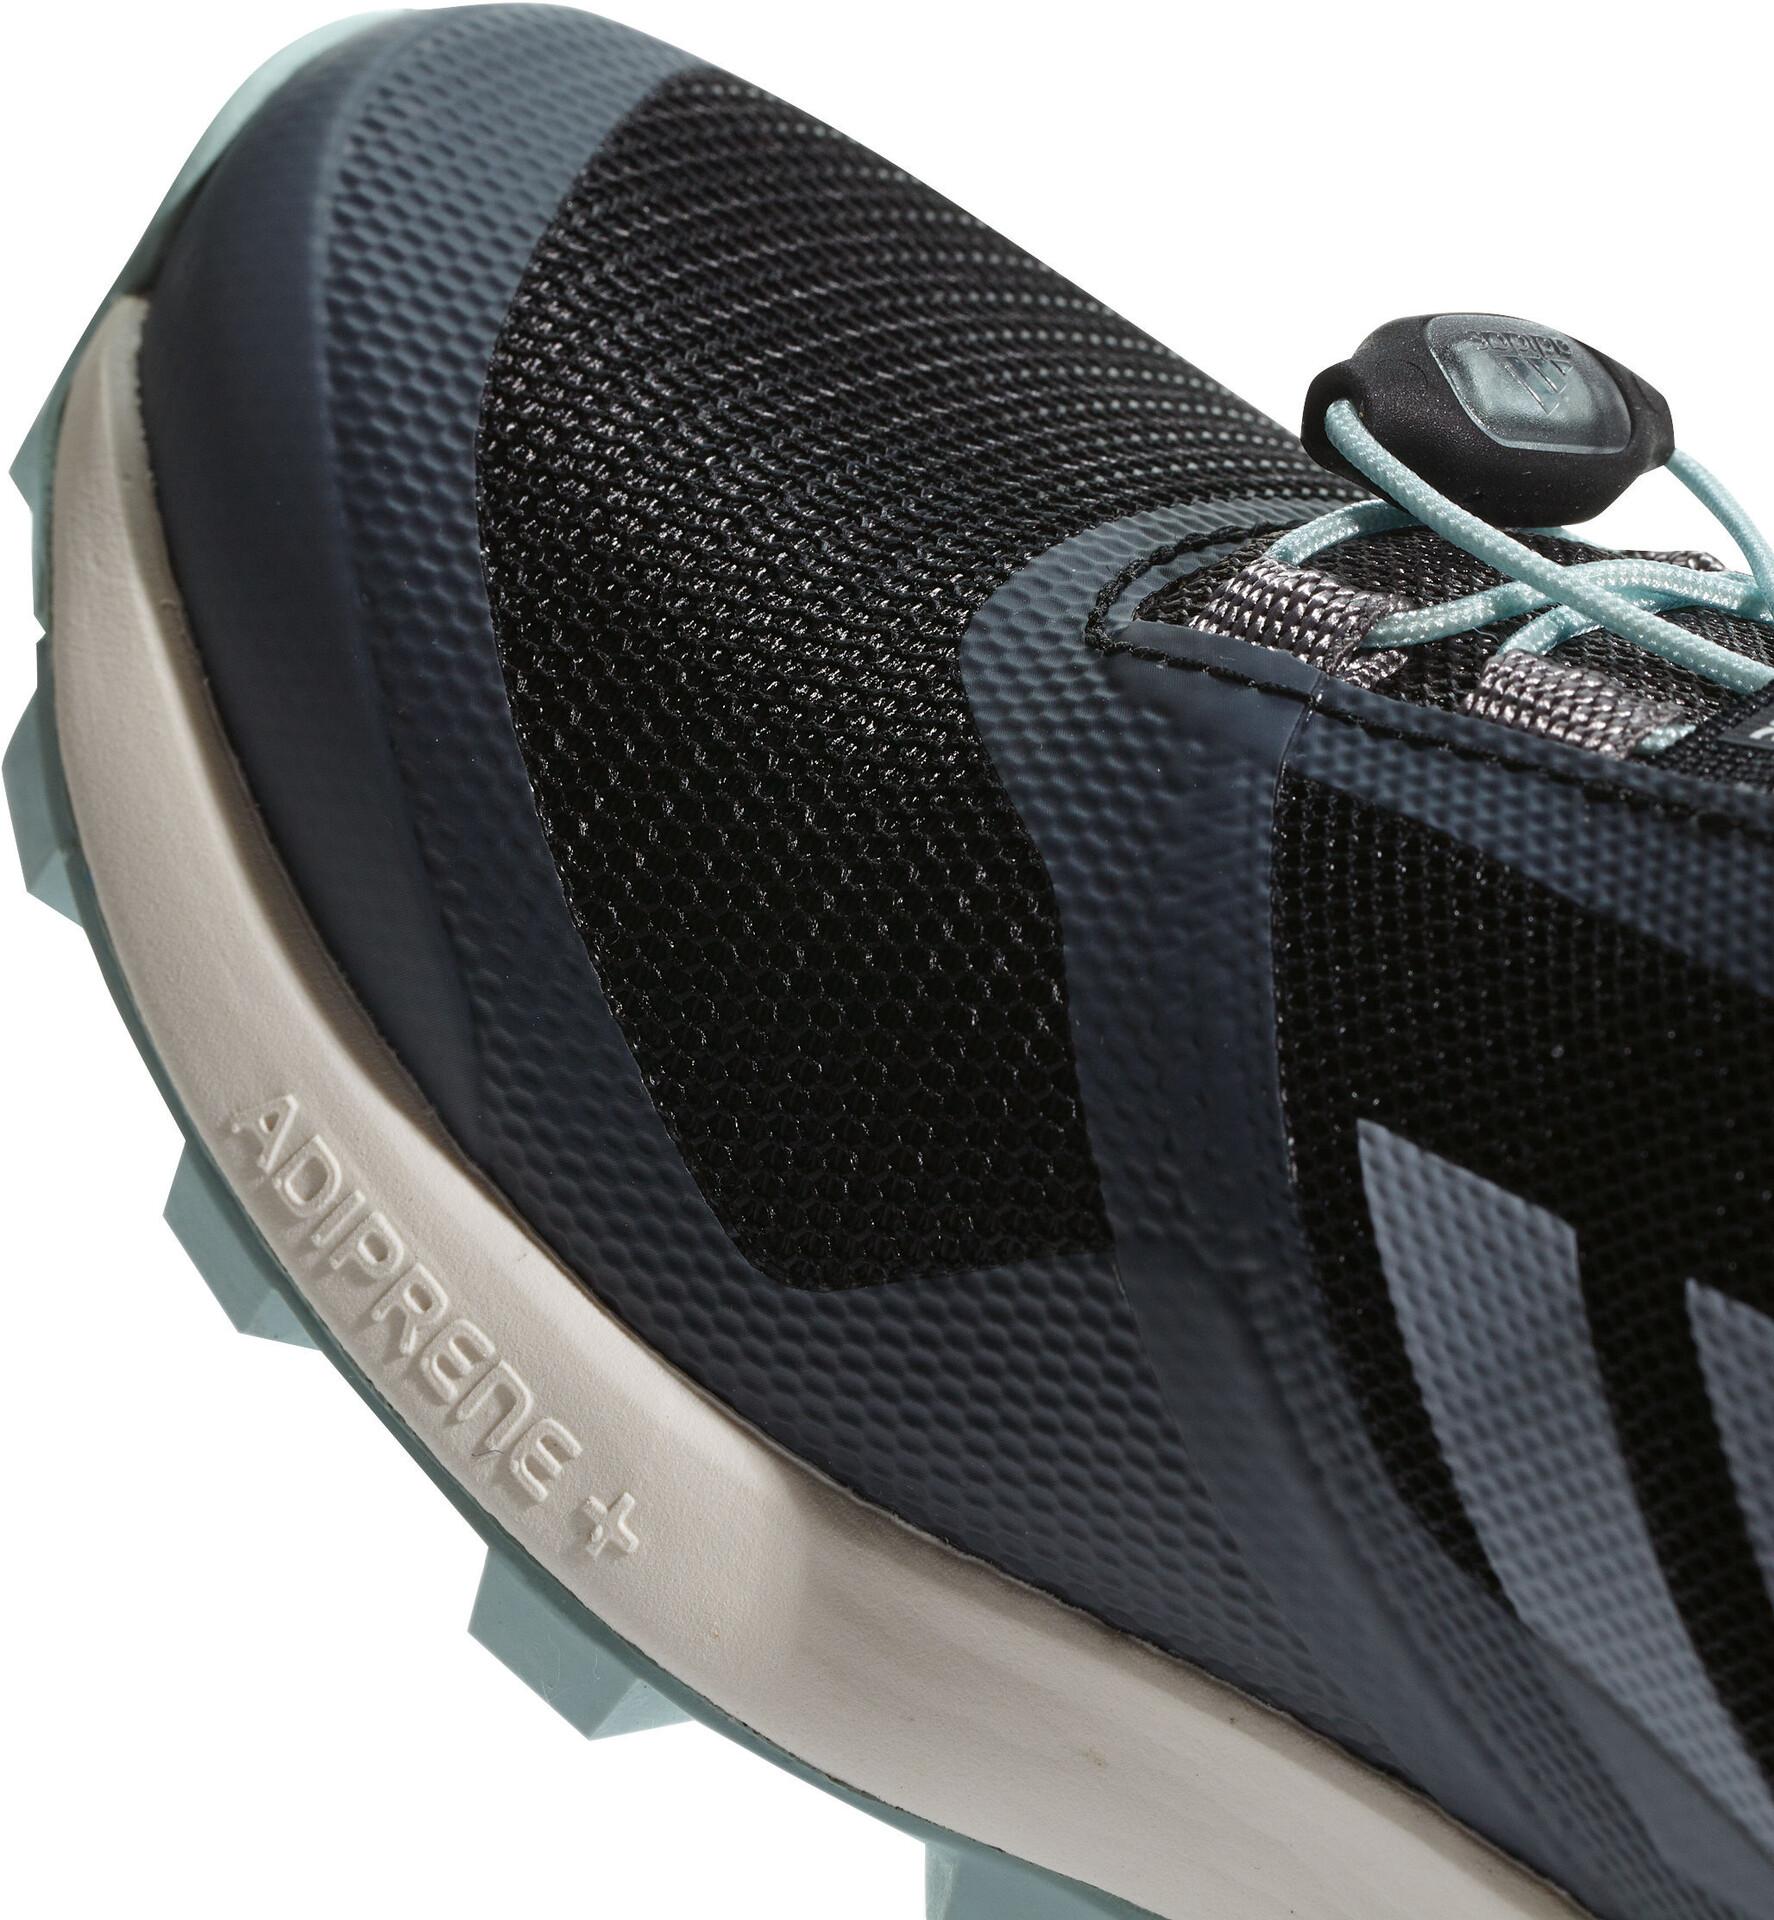 adidas TERREX gris/Turquesa Trailmaker Zapatillas running Mujer gris/Turquesa TERREX 0cdef6